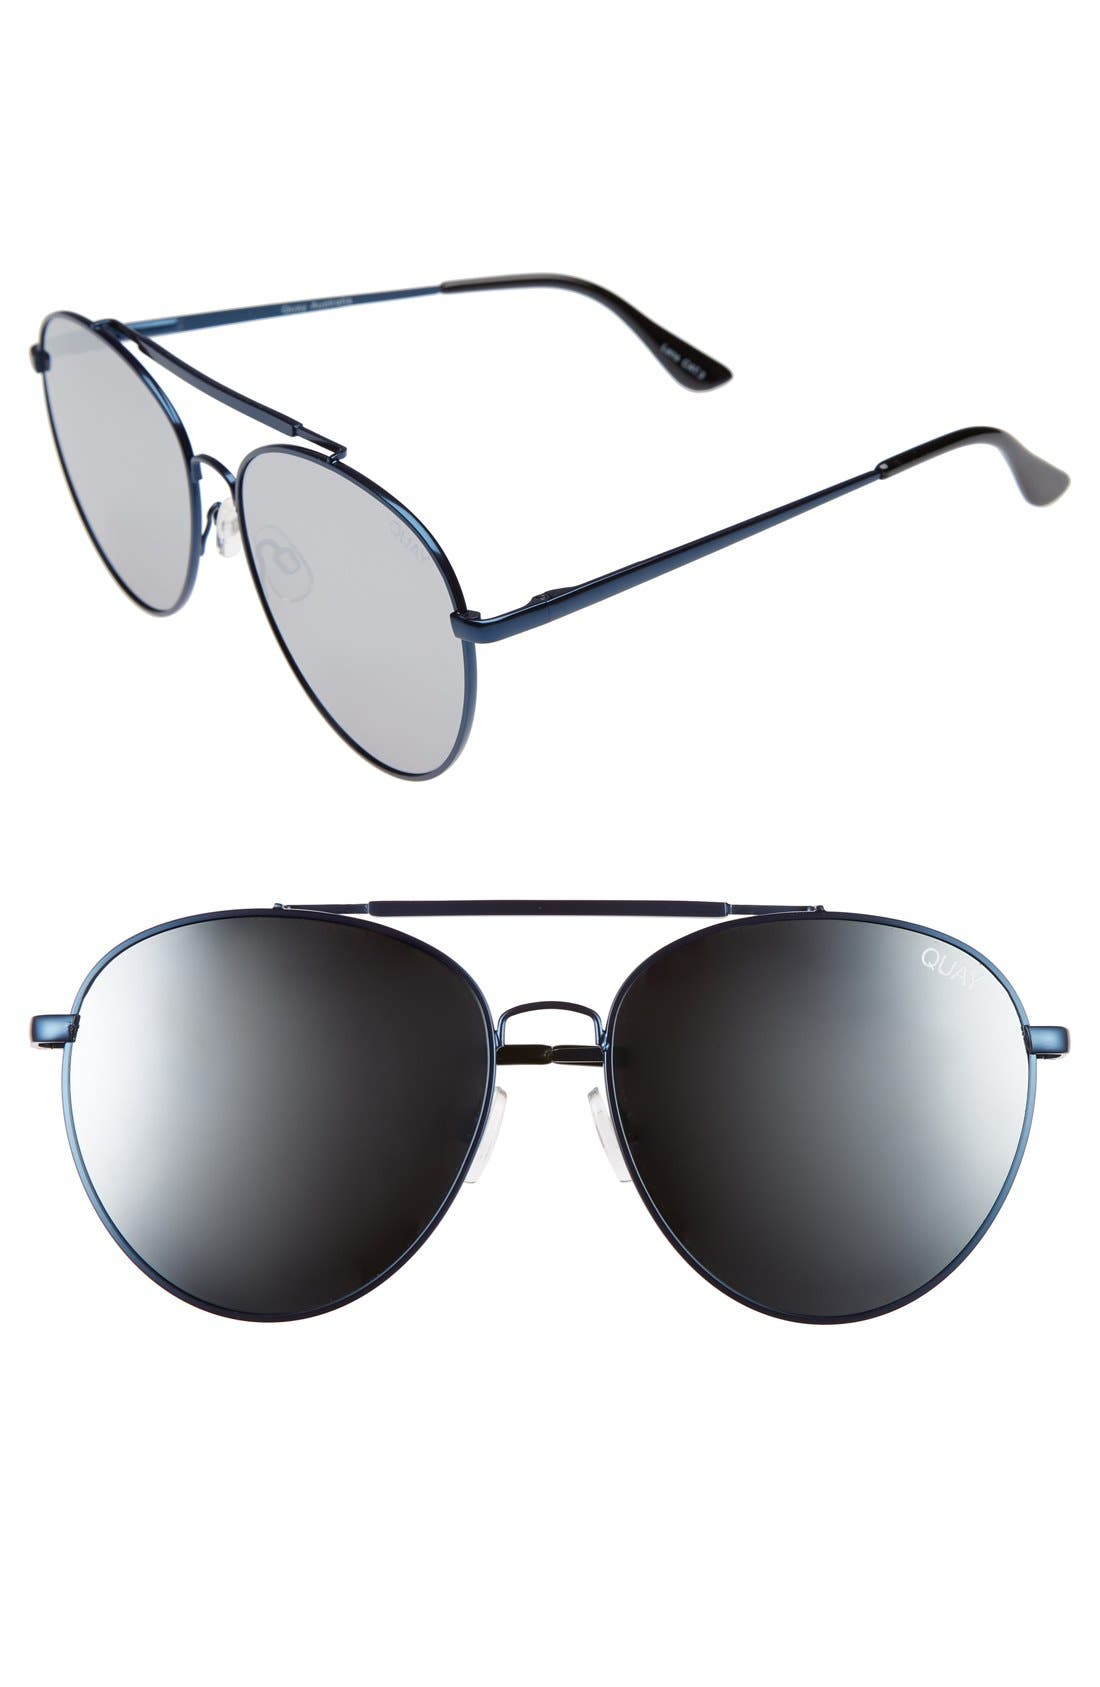 Lickety Split 58mm Aviator Sunglasses,                             Main thumbnail 1, color,                             040